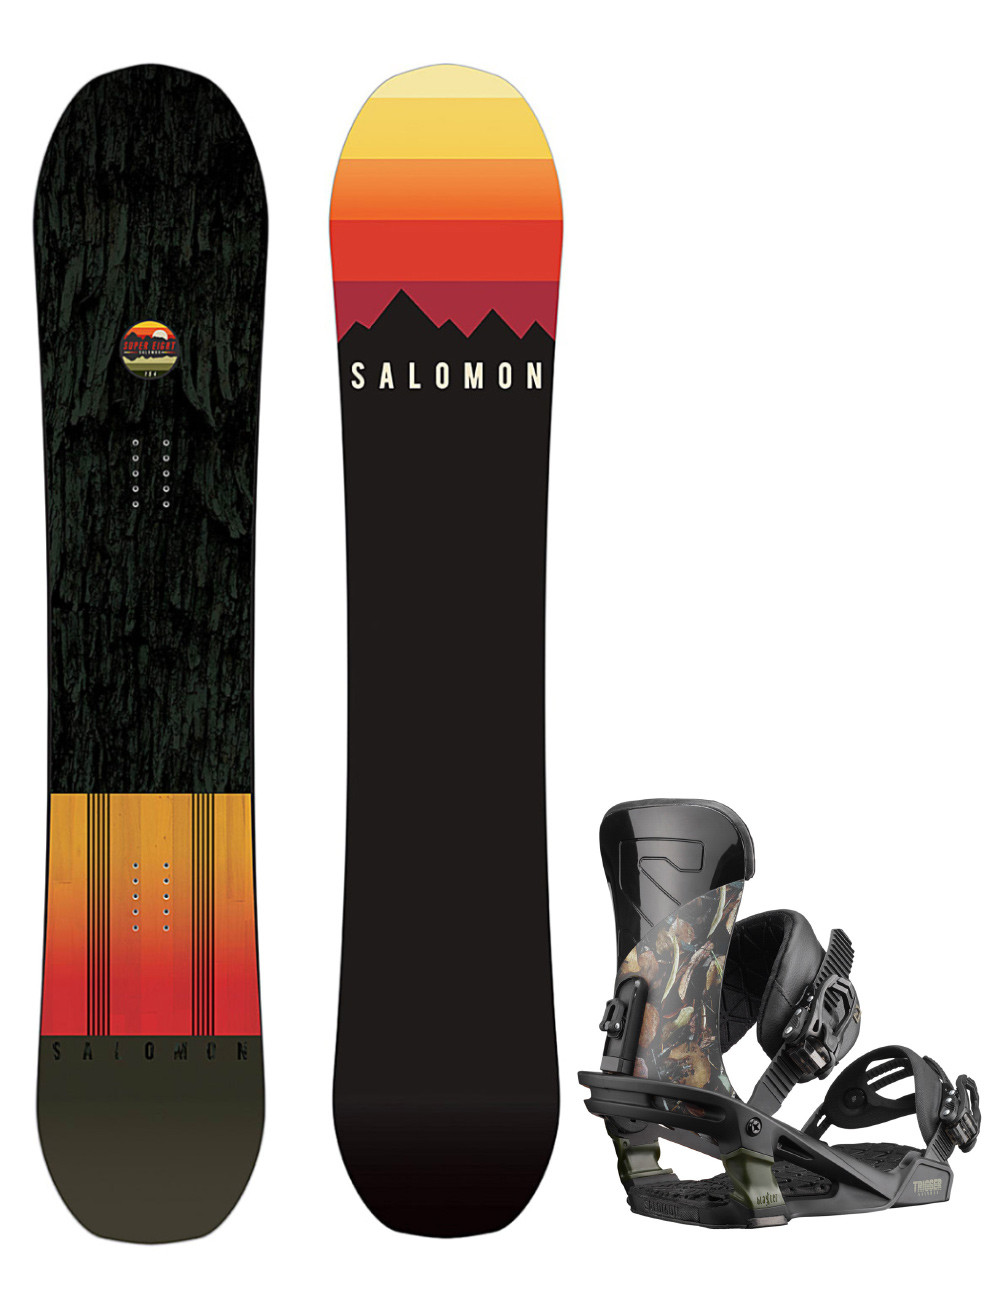 Zestaw Salomon Super 8 + Salomon Trigger L